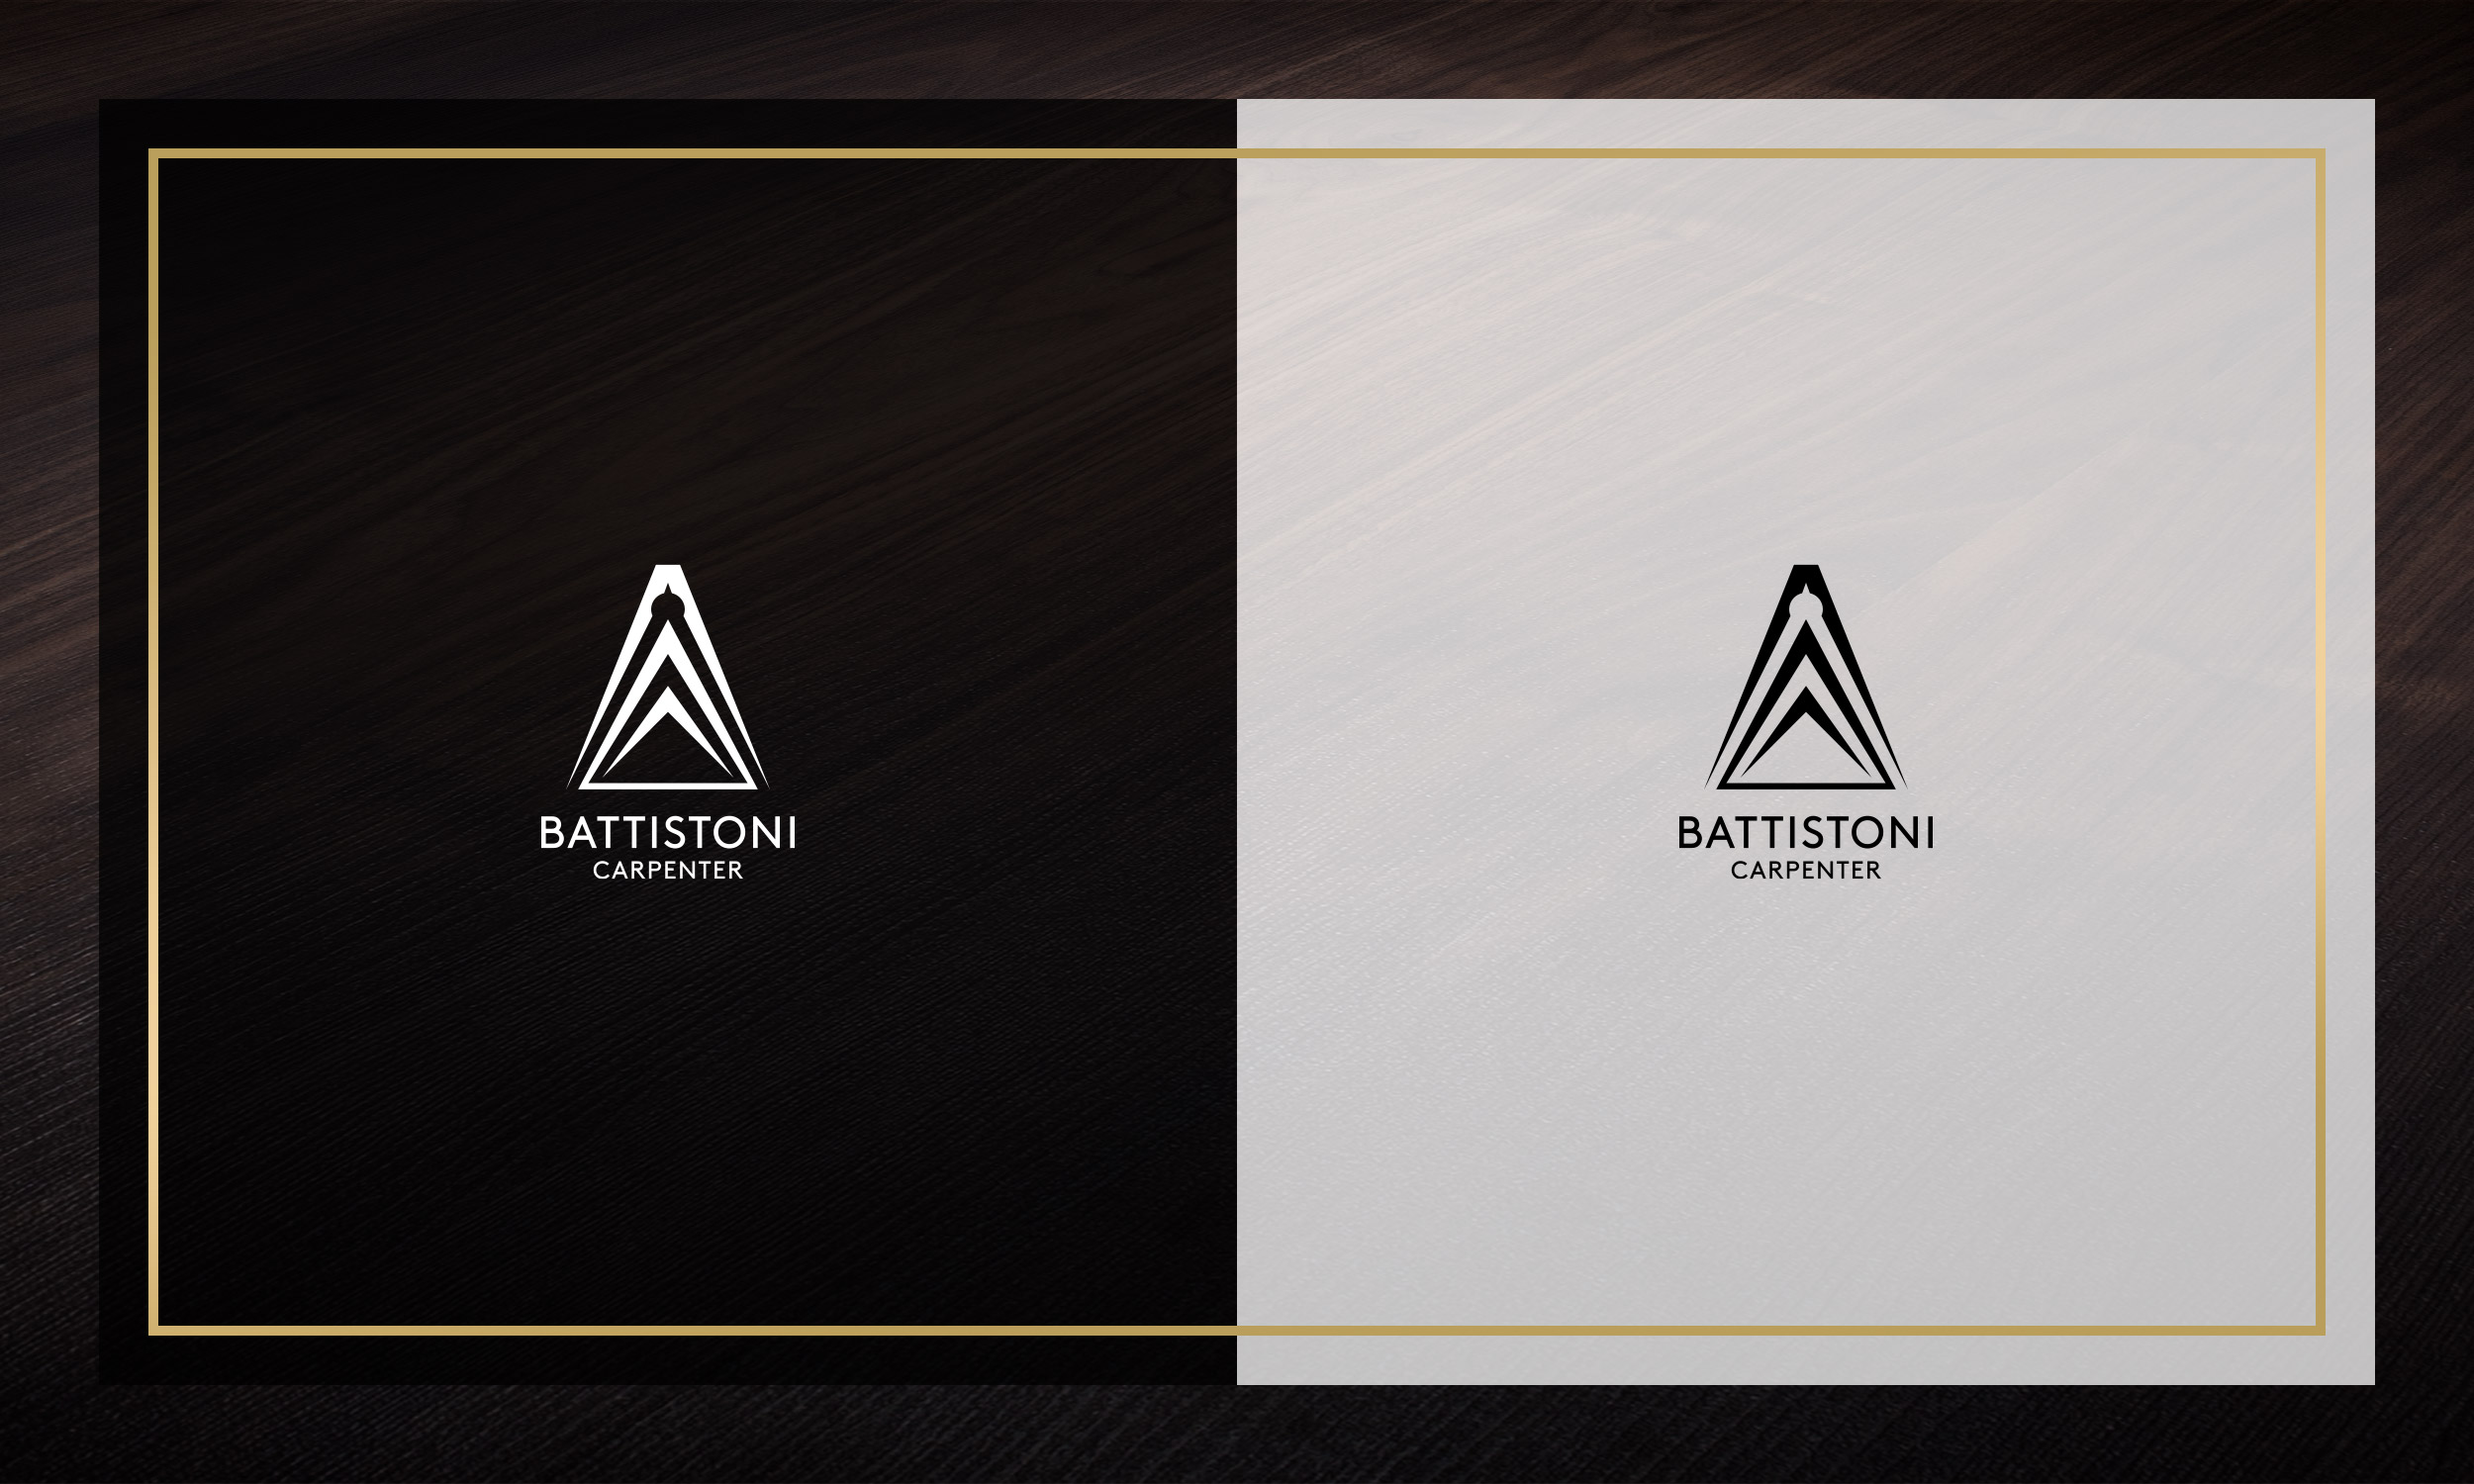 m_battistoni_logo-show